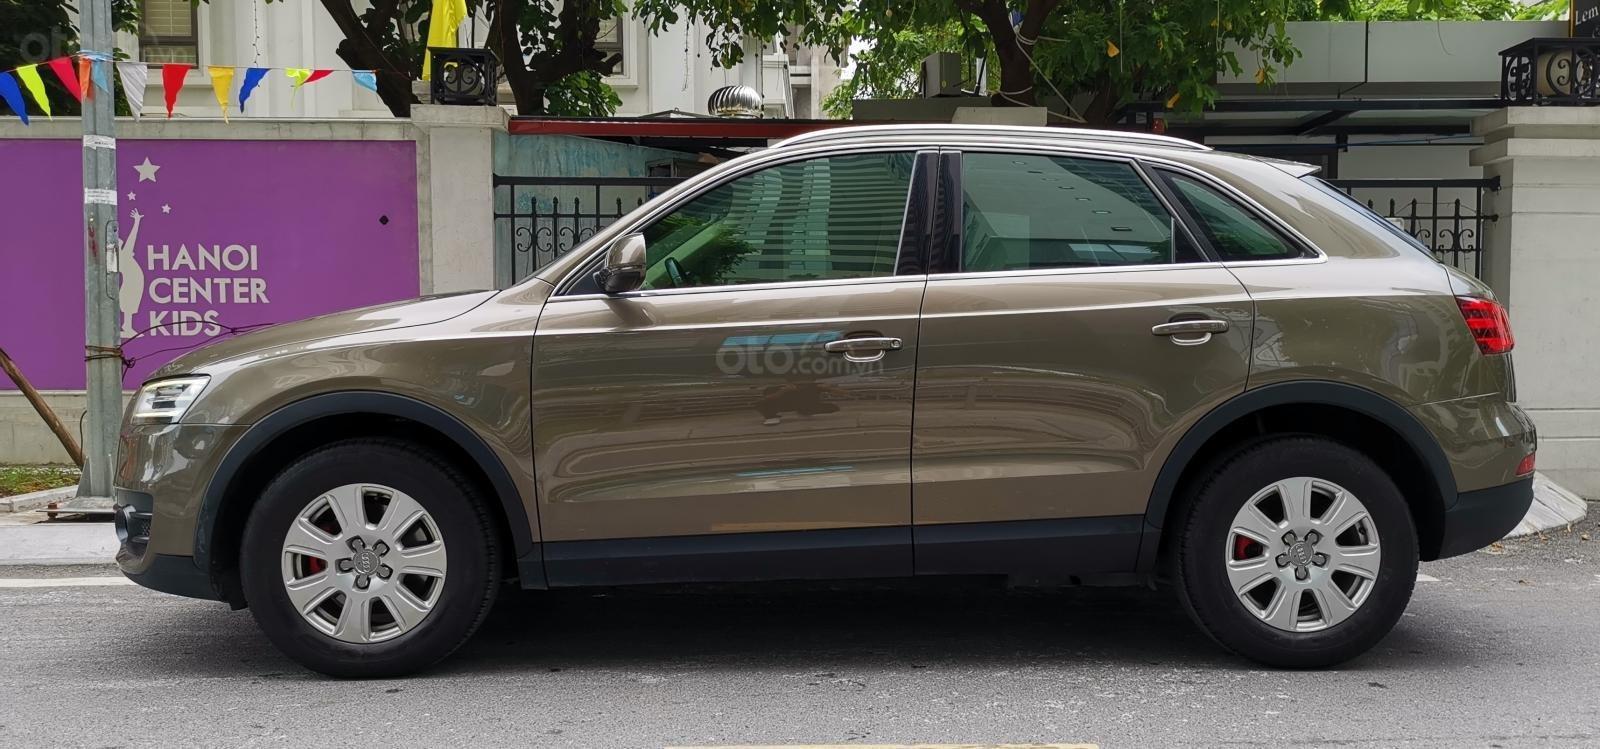 Audi Q3 2.0 Quattro nhập khẩu 2015 (3)